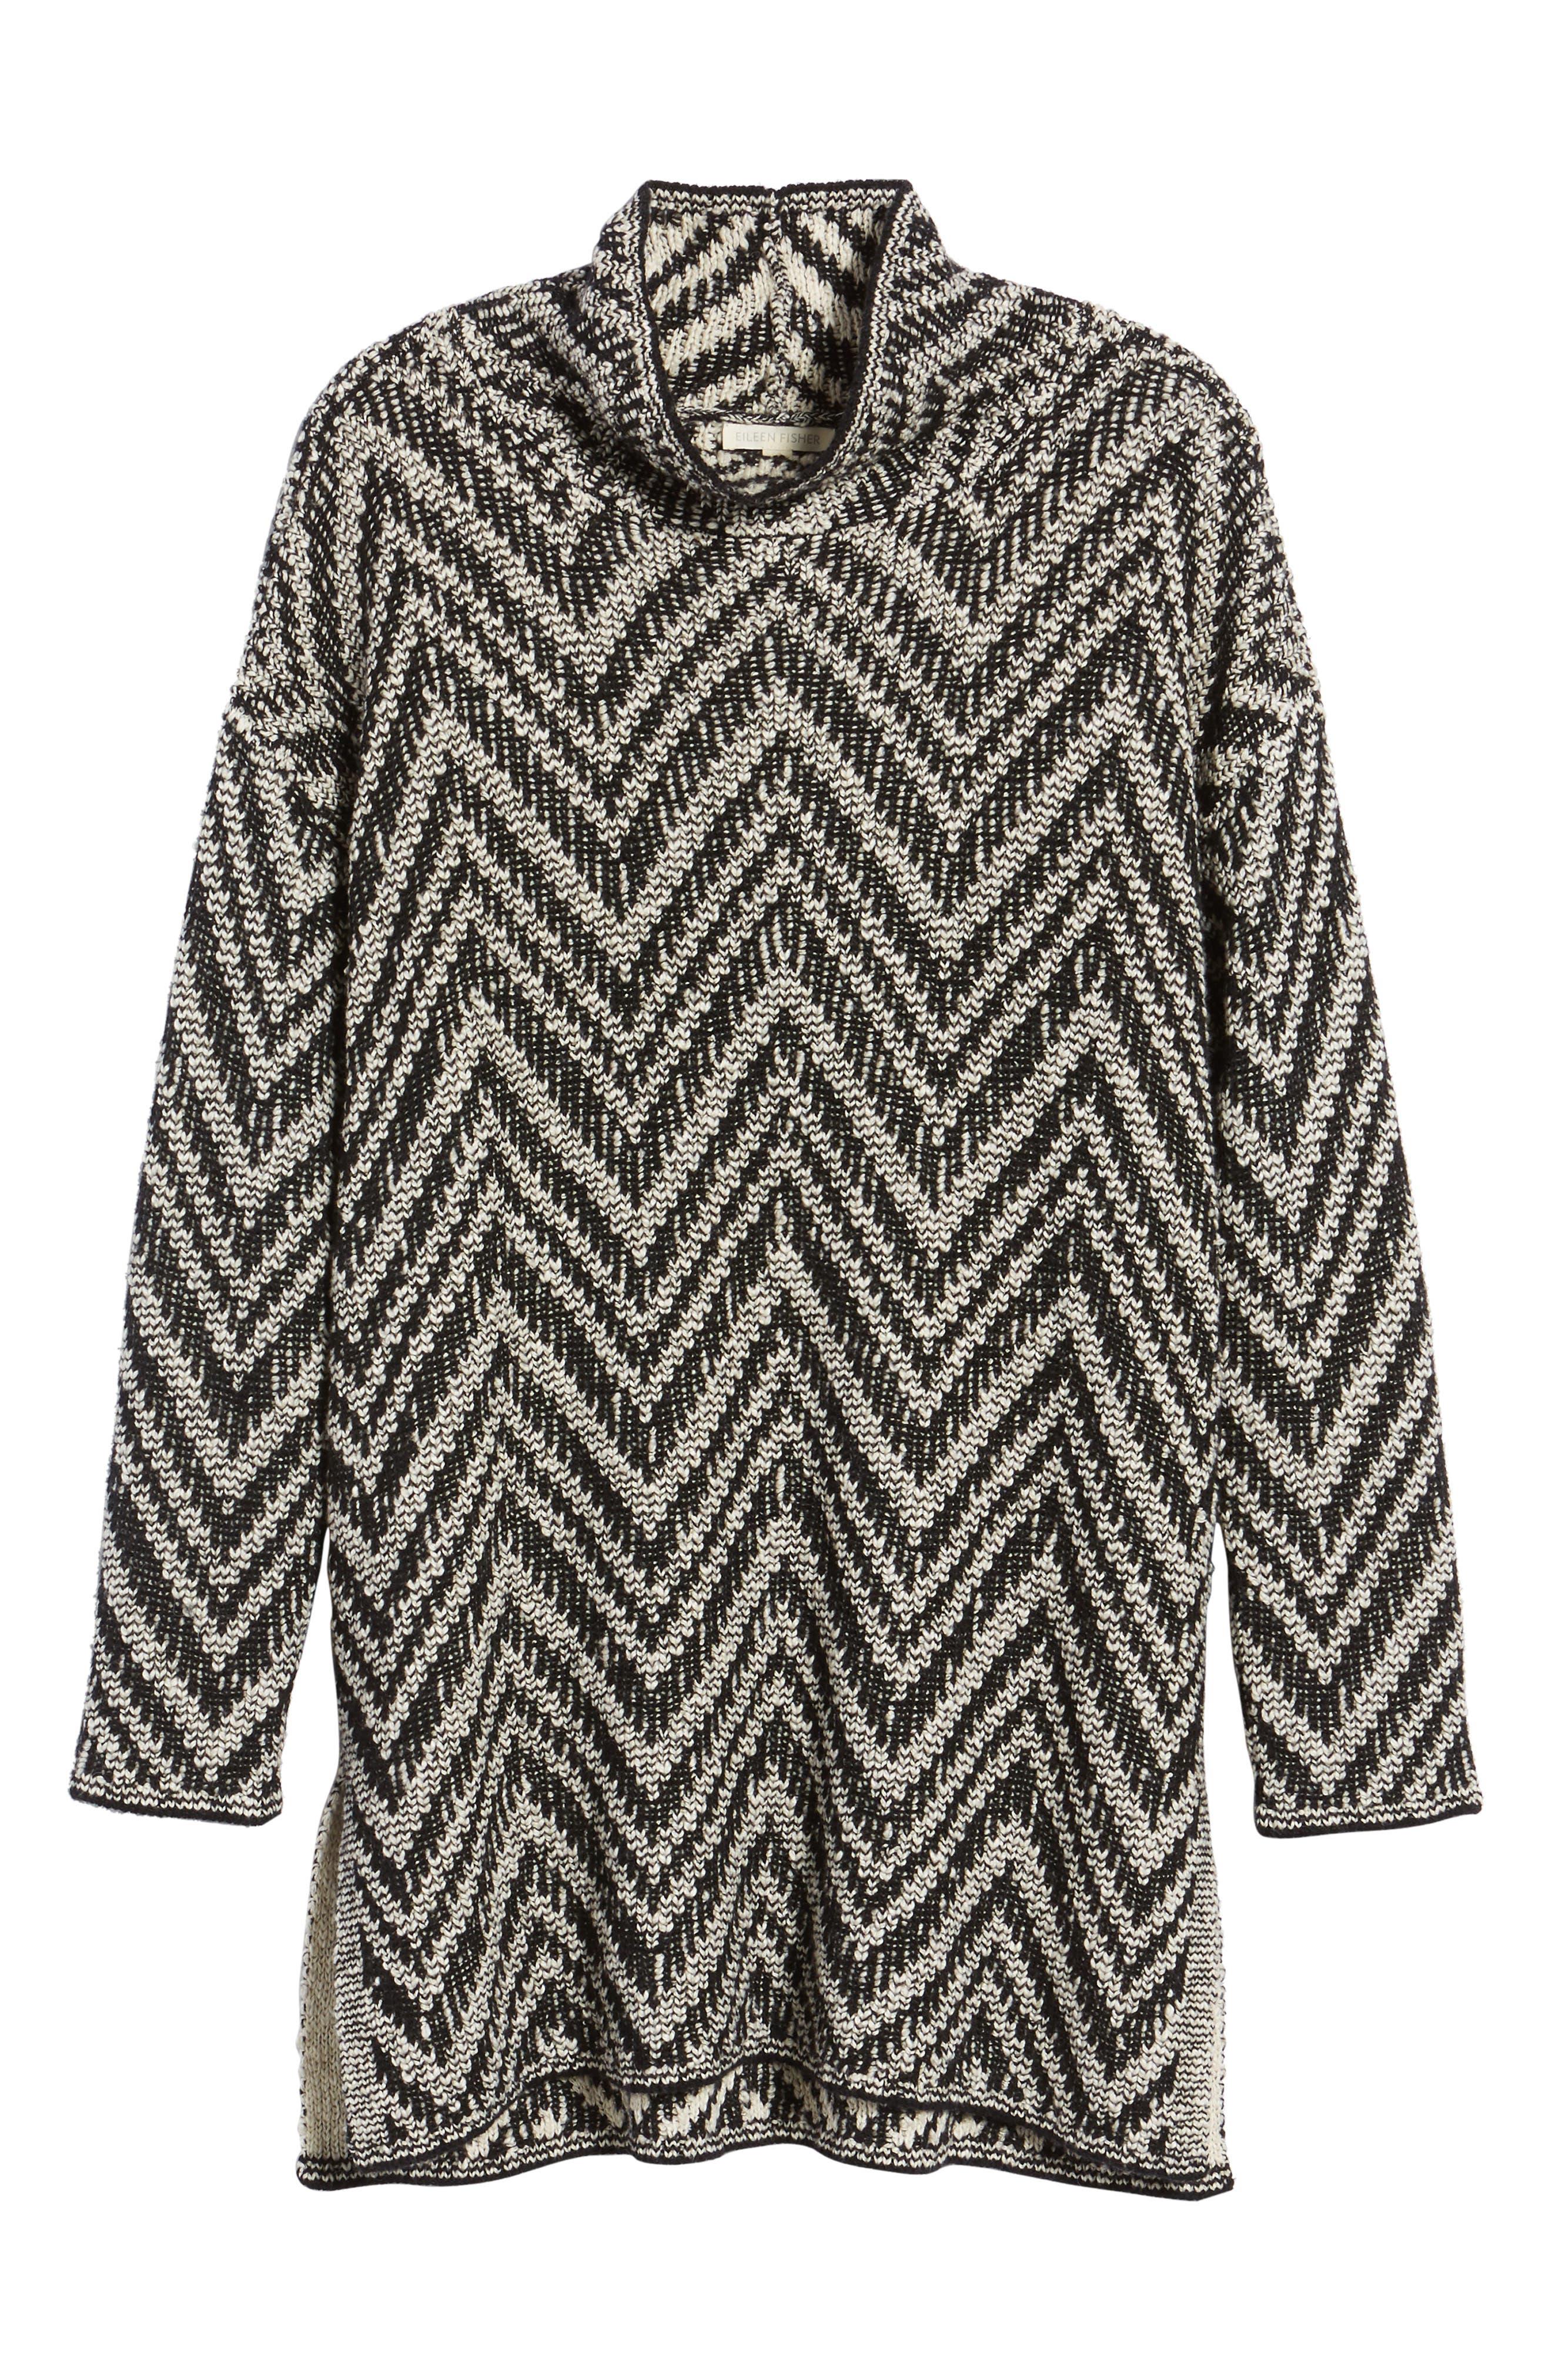 Zigzag Organic Cotton & Alpaca Tunic Sweater,                             Alternate thumbnail 6, color,                             Black/ Soft White